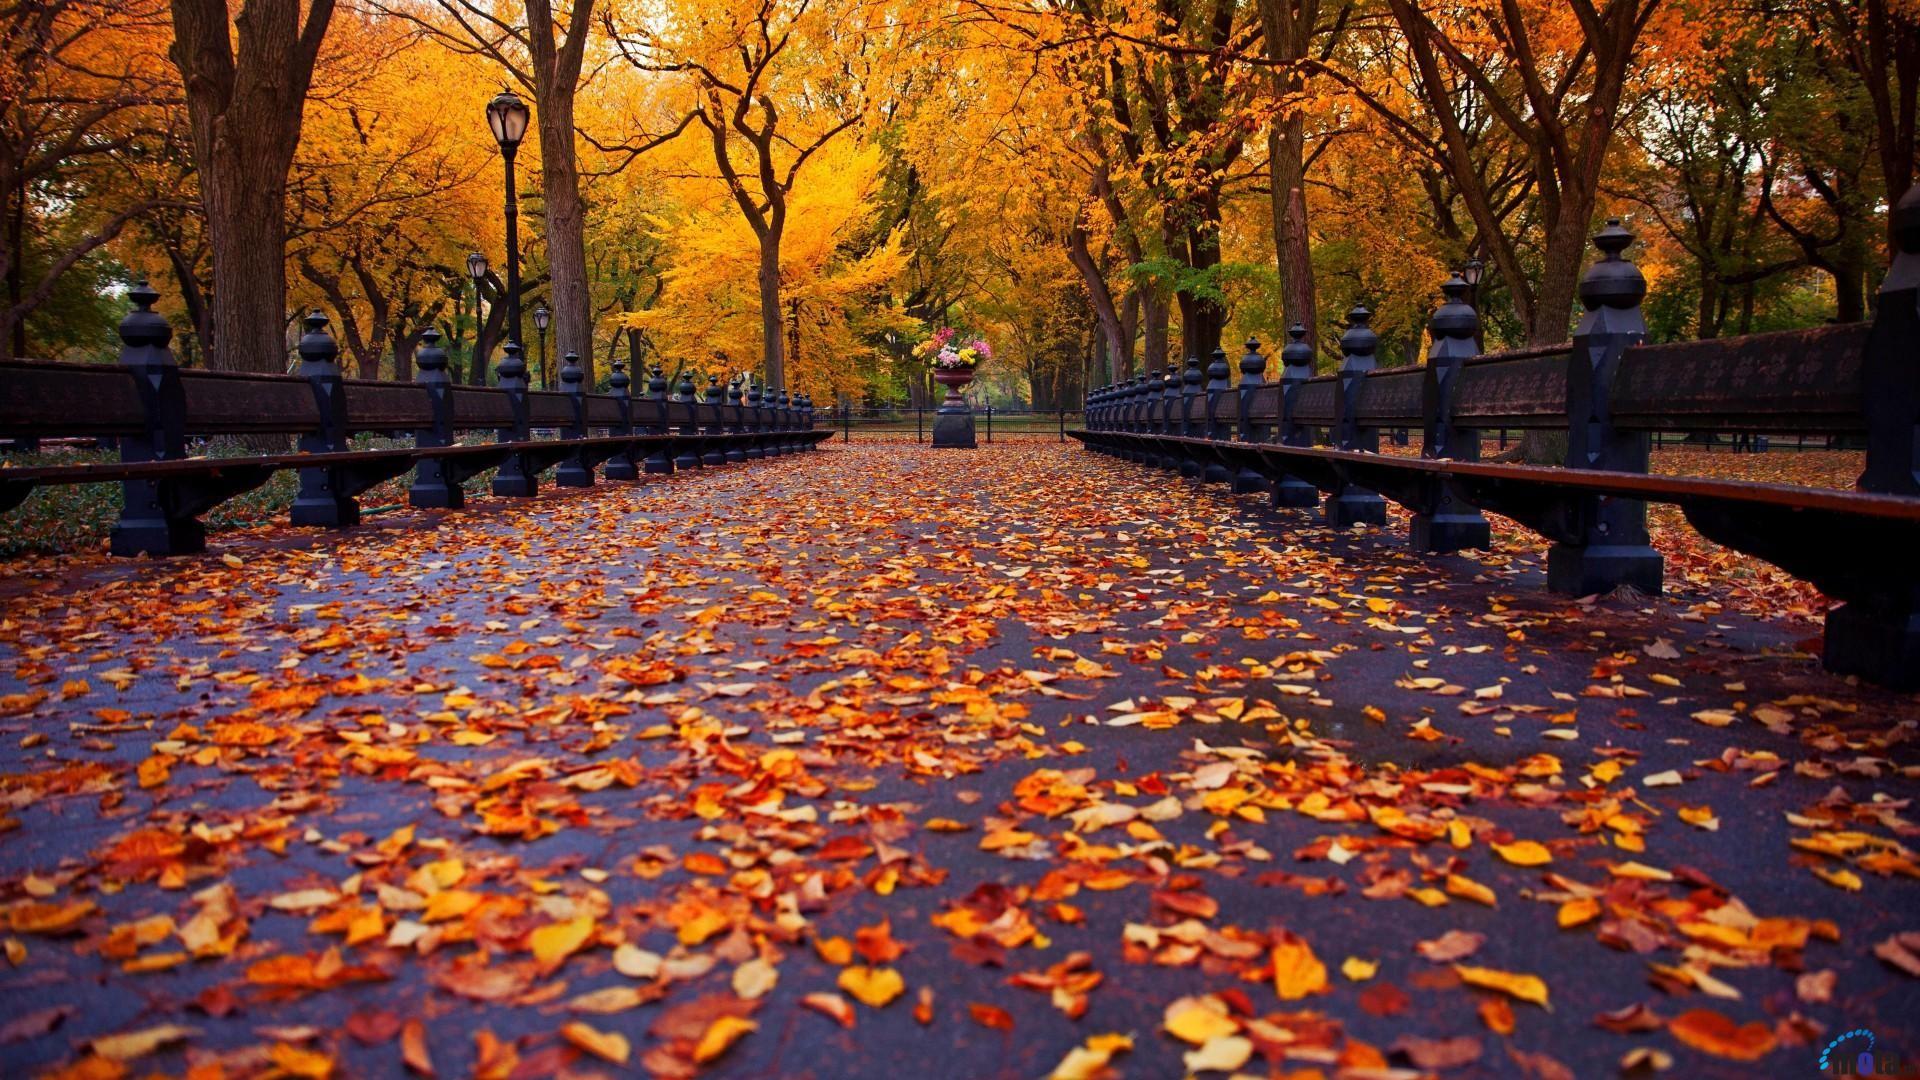 Free Download 58 Autumn Desktop Wallpapers On Wallpaperplay